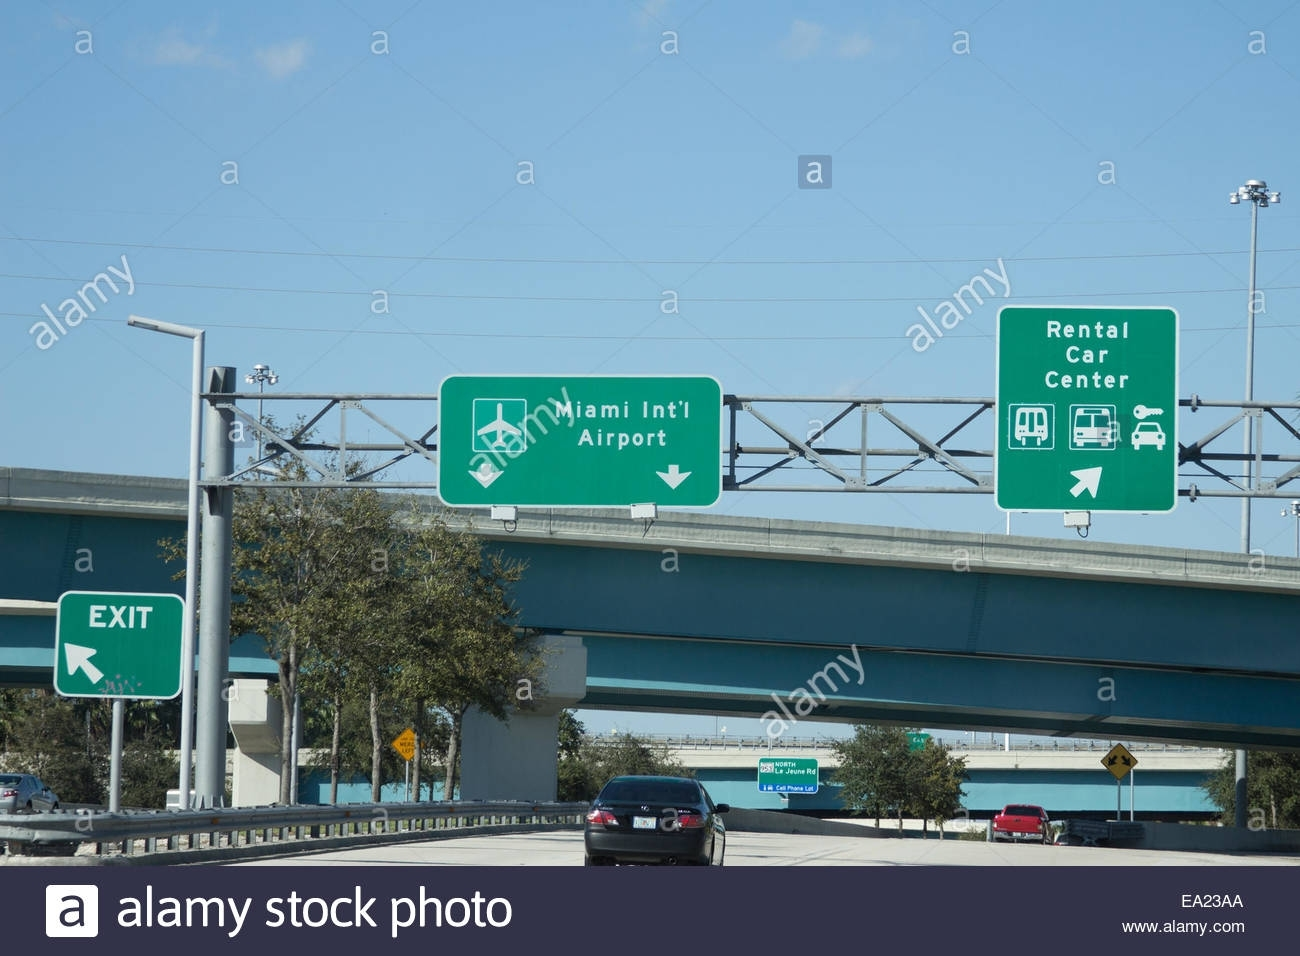 Miami International Airport Car Rental Return Zeichen throughout Miami Airport Car Rental Return Alamo